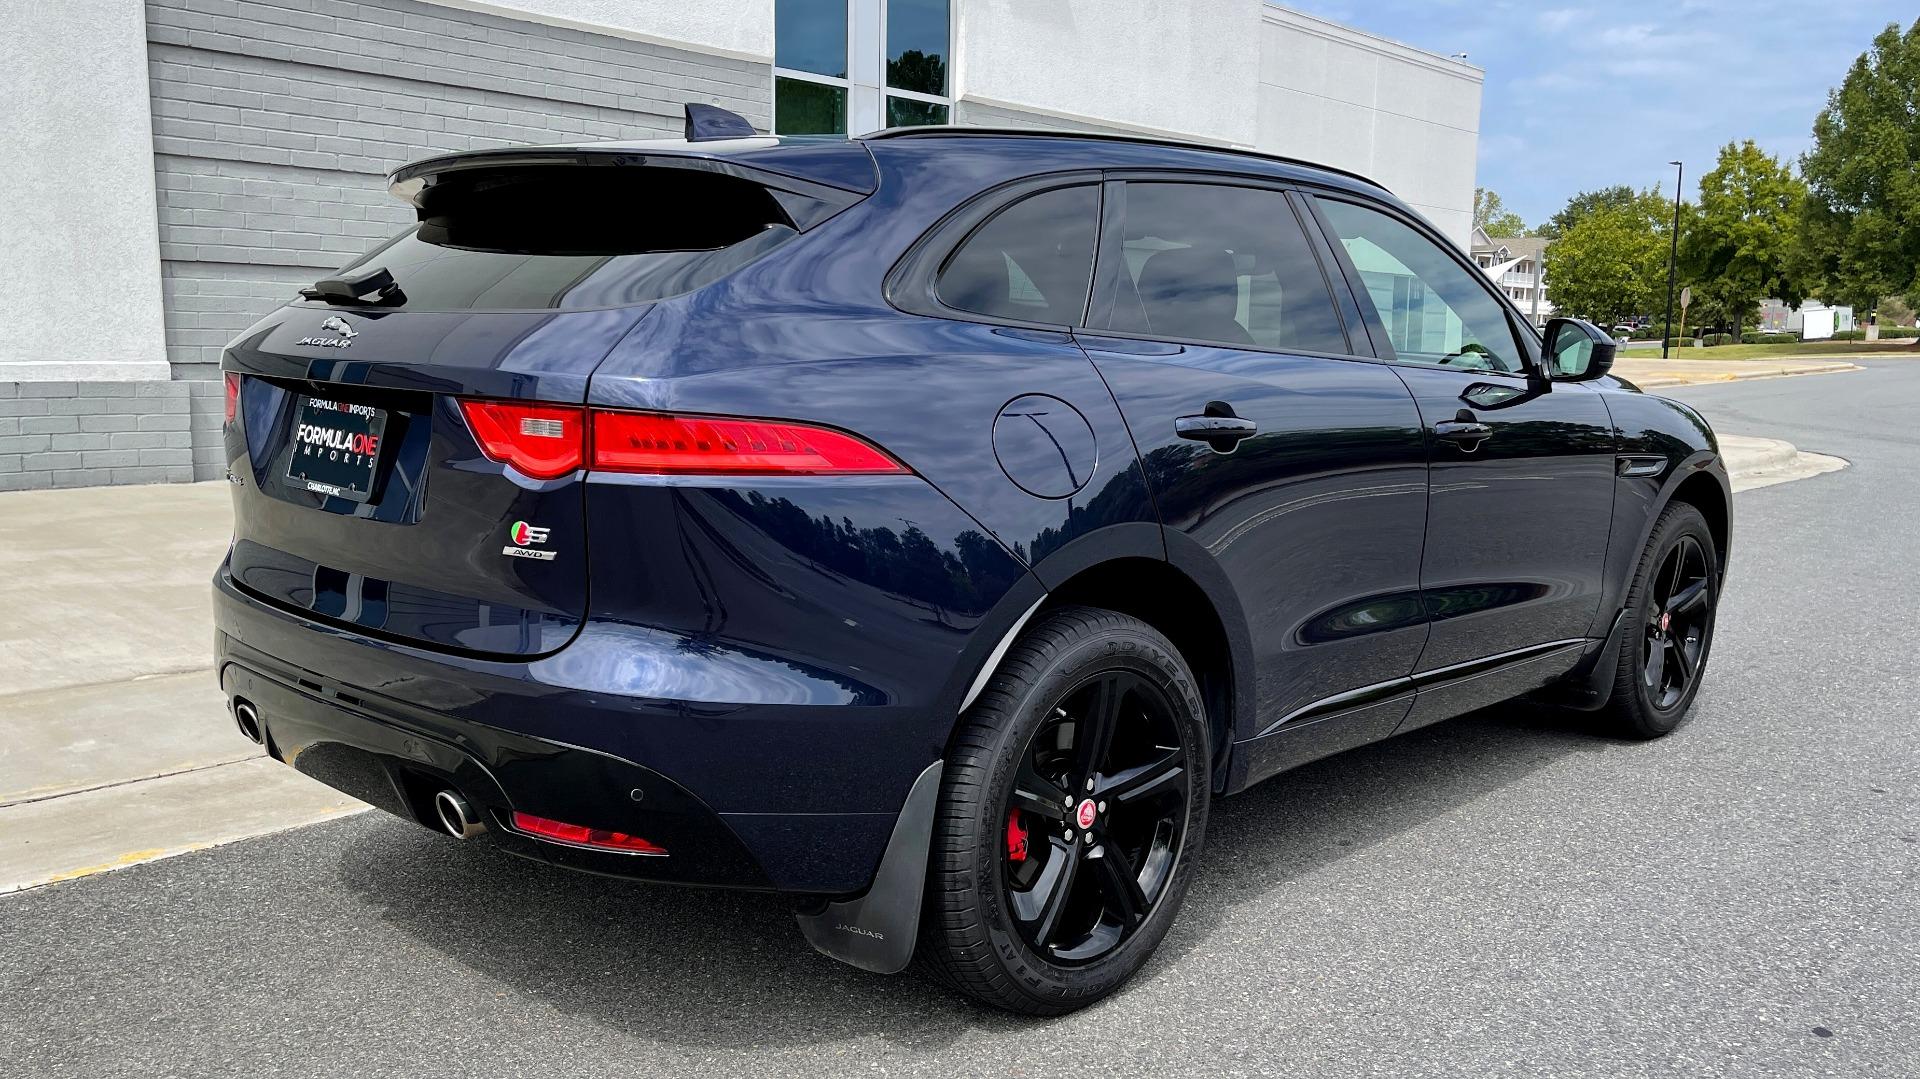 Used 2019 Jaguar F-PACE S / DRIVE PKG / BSA / HUD / BLACK EXT PKG / REARVIEW for sale $50,995 at Formula Imports in Charlotte NC 28227 2